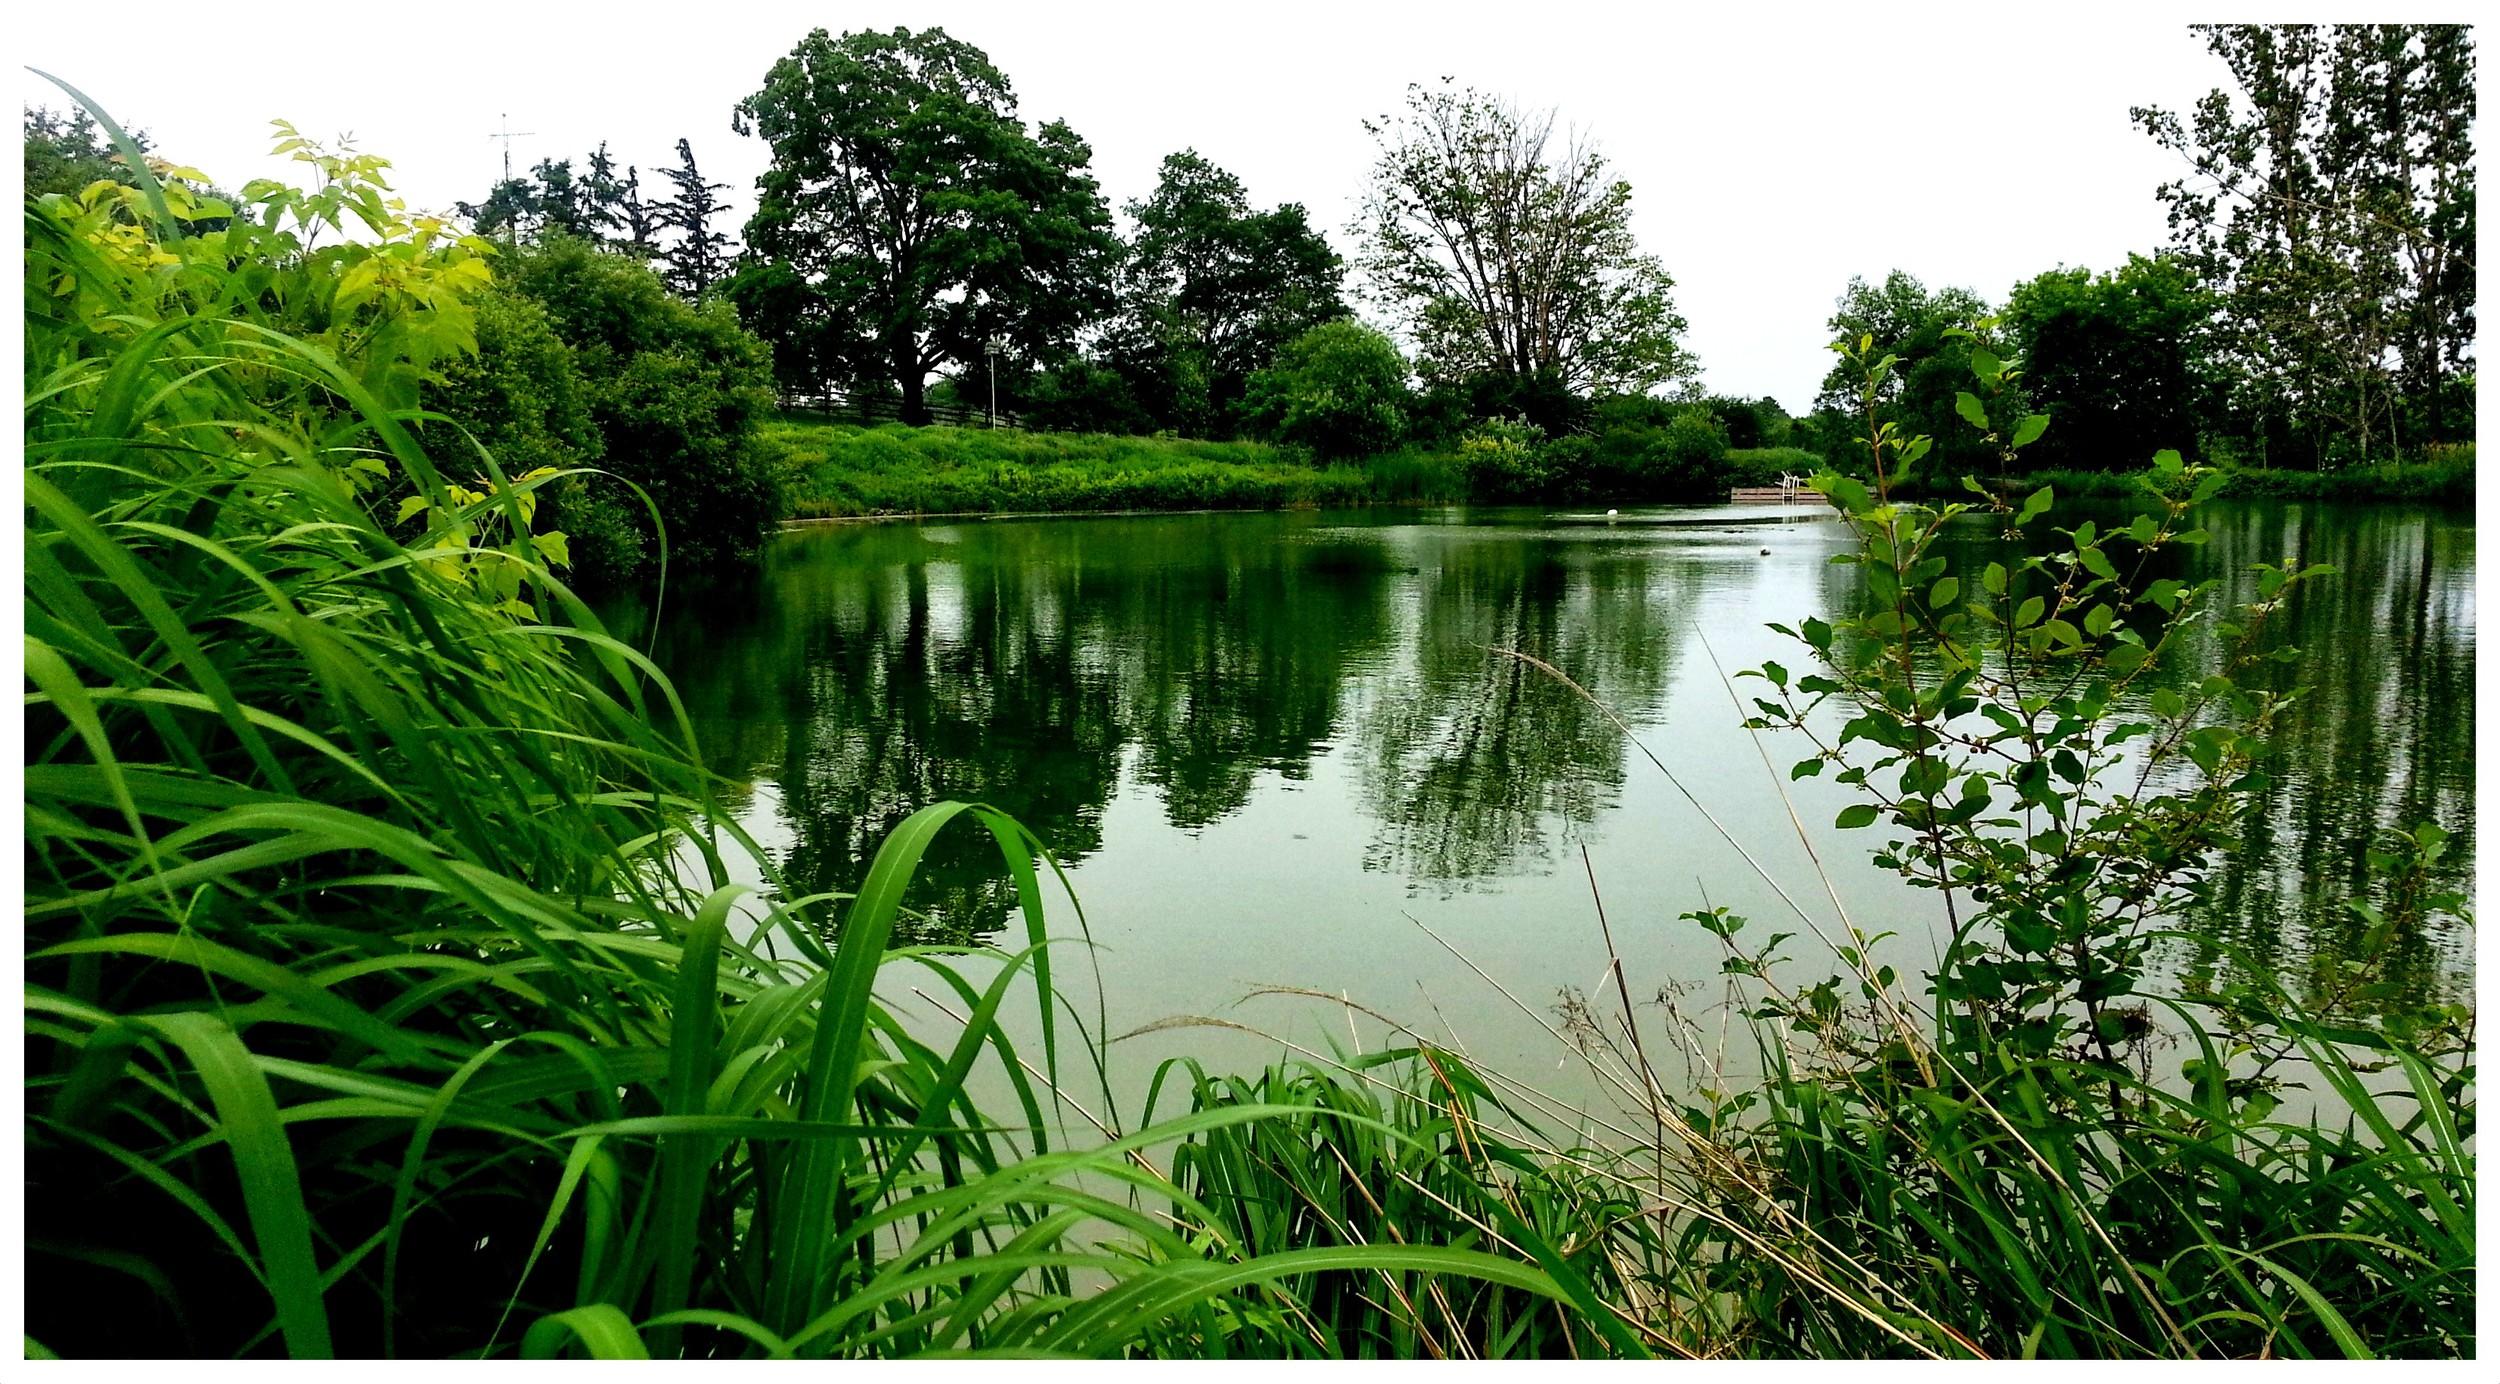 The pond July 2013.jpg